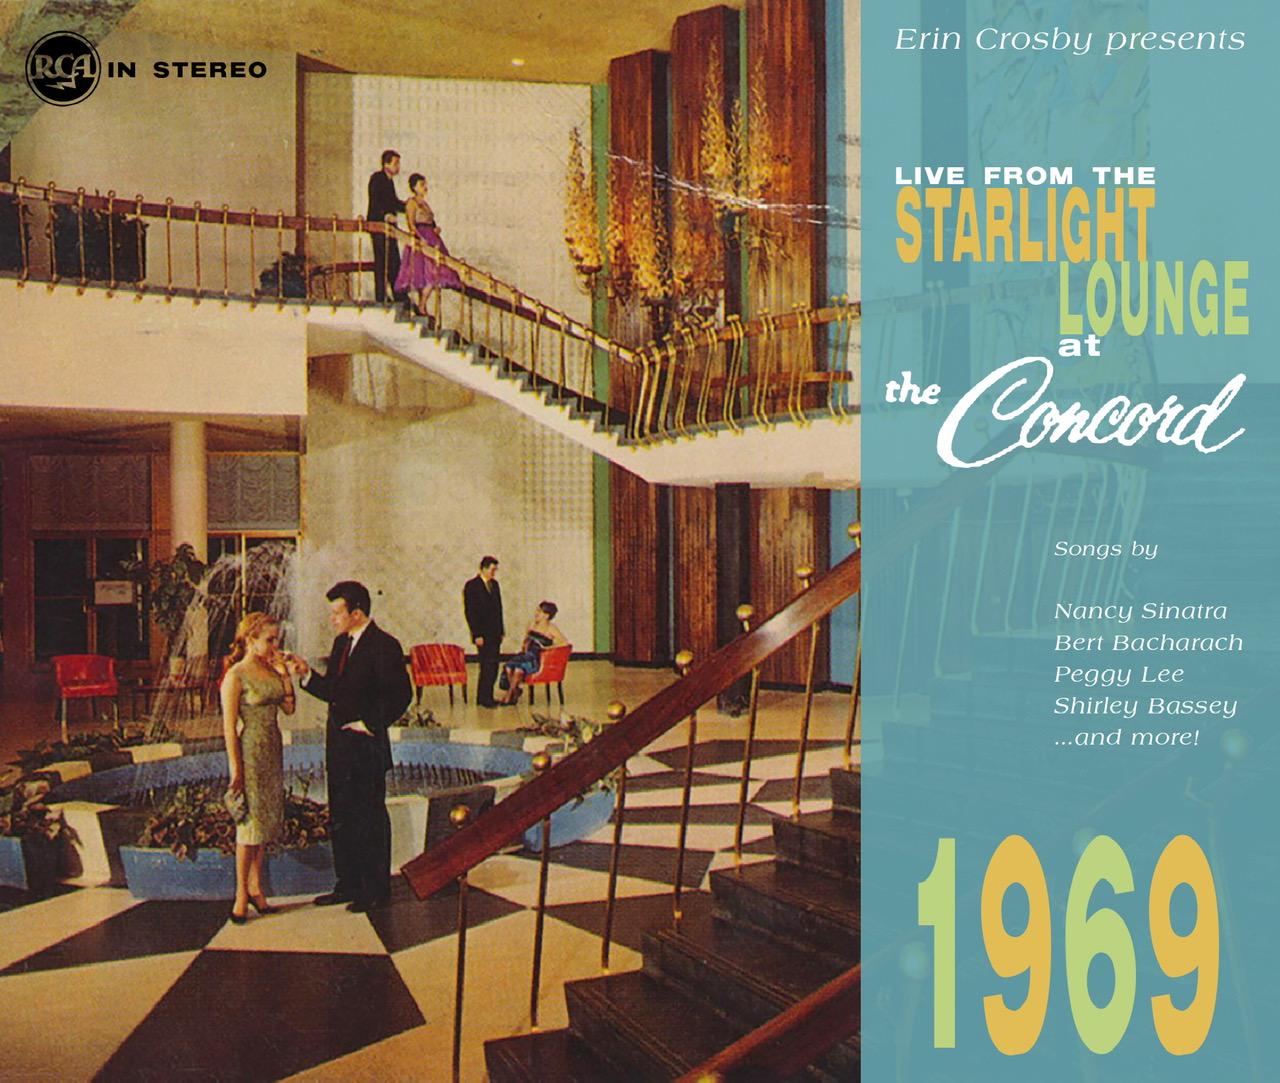 erin crosby starlight lounge